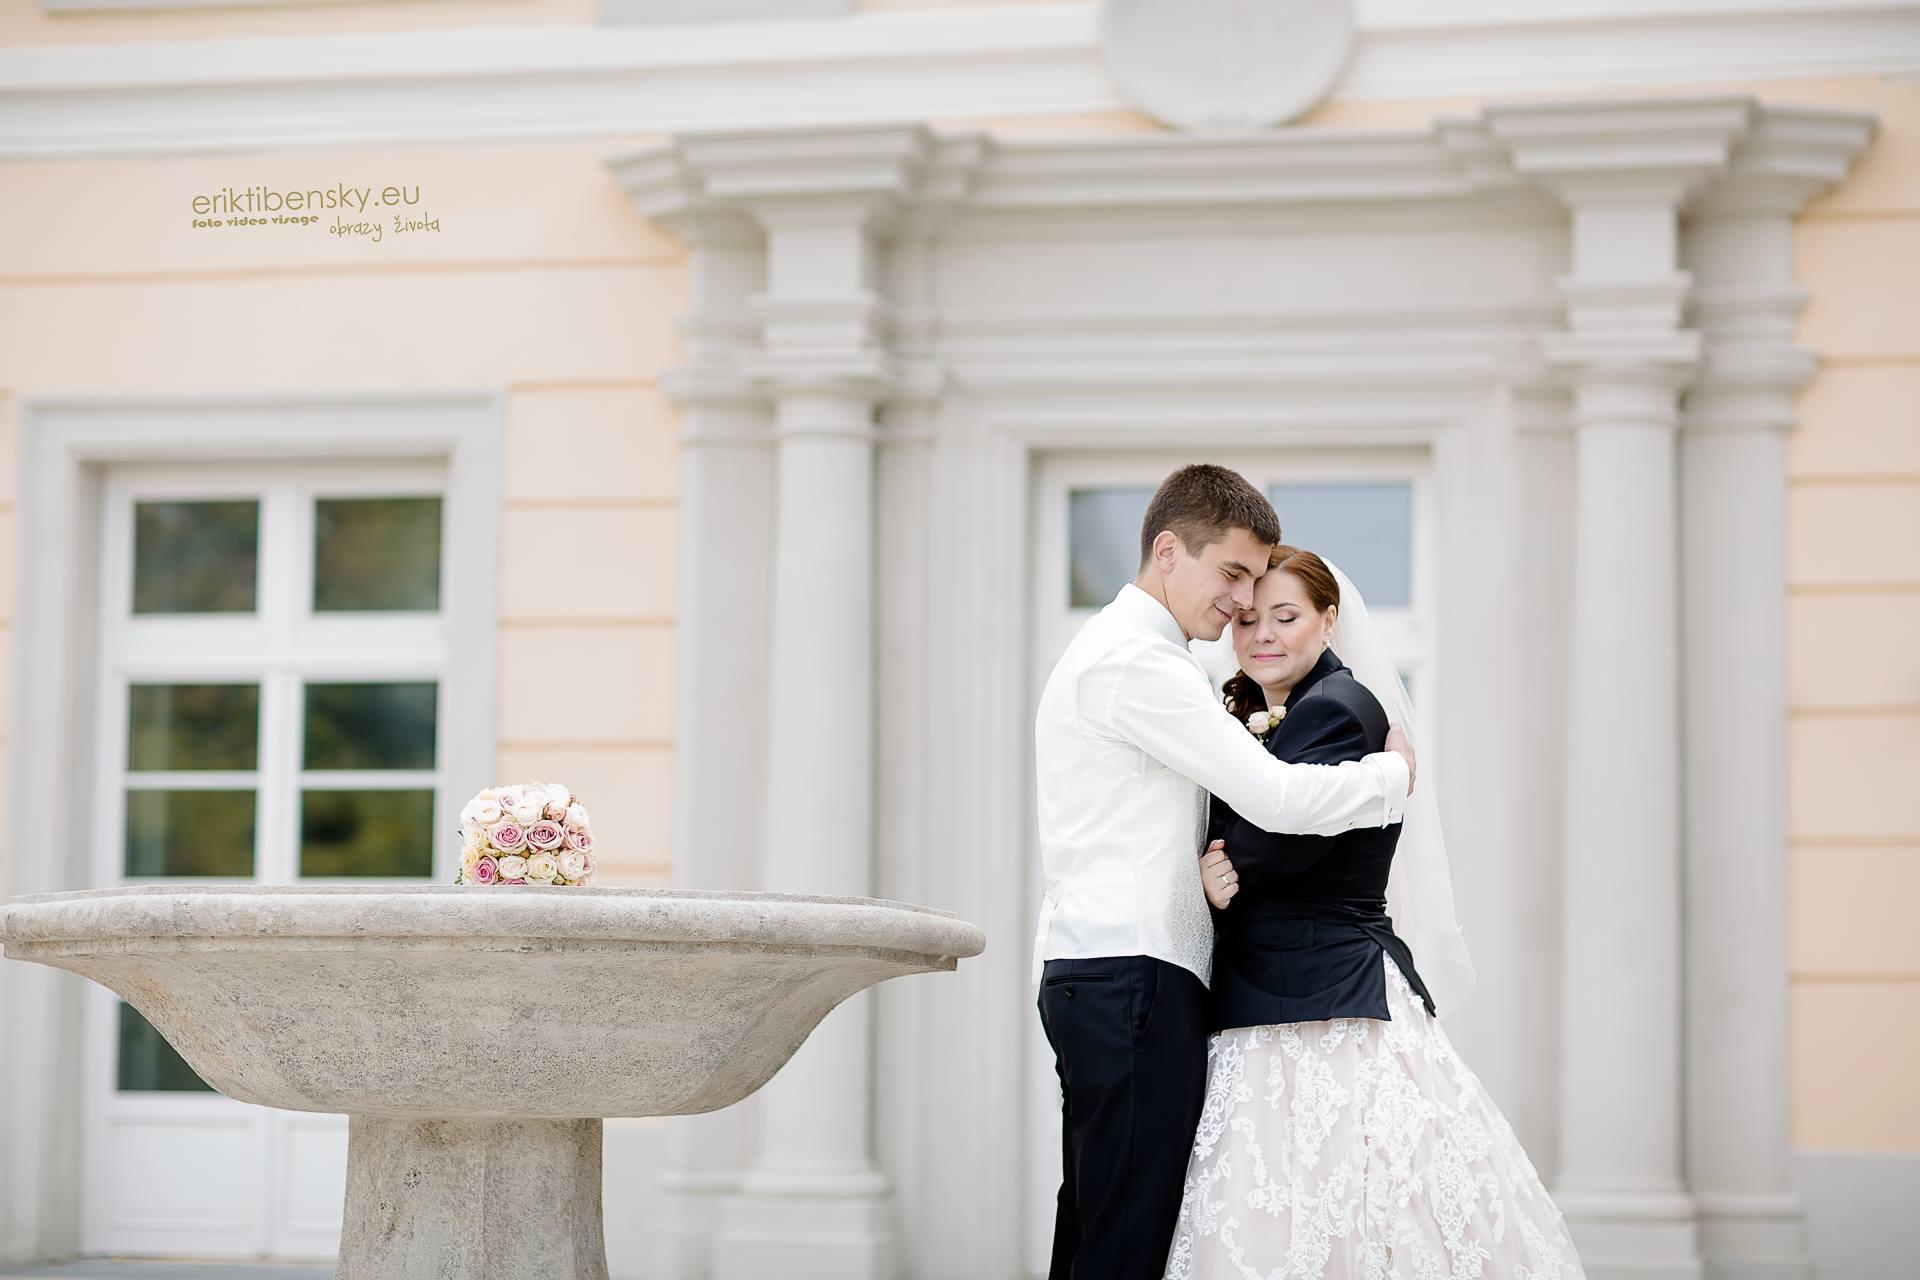 eriktibensky-eu-svadobny-fotograf-wedding-photographer-3078